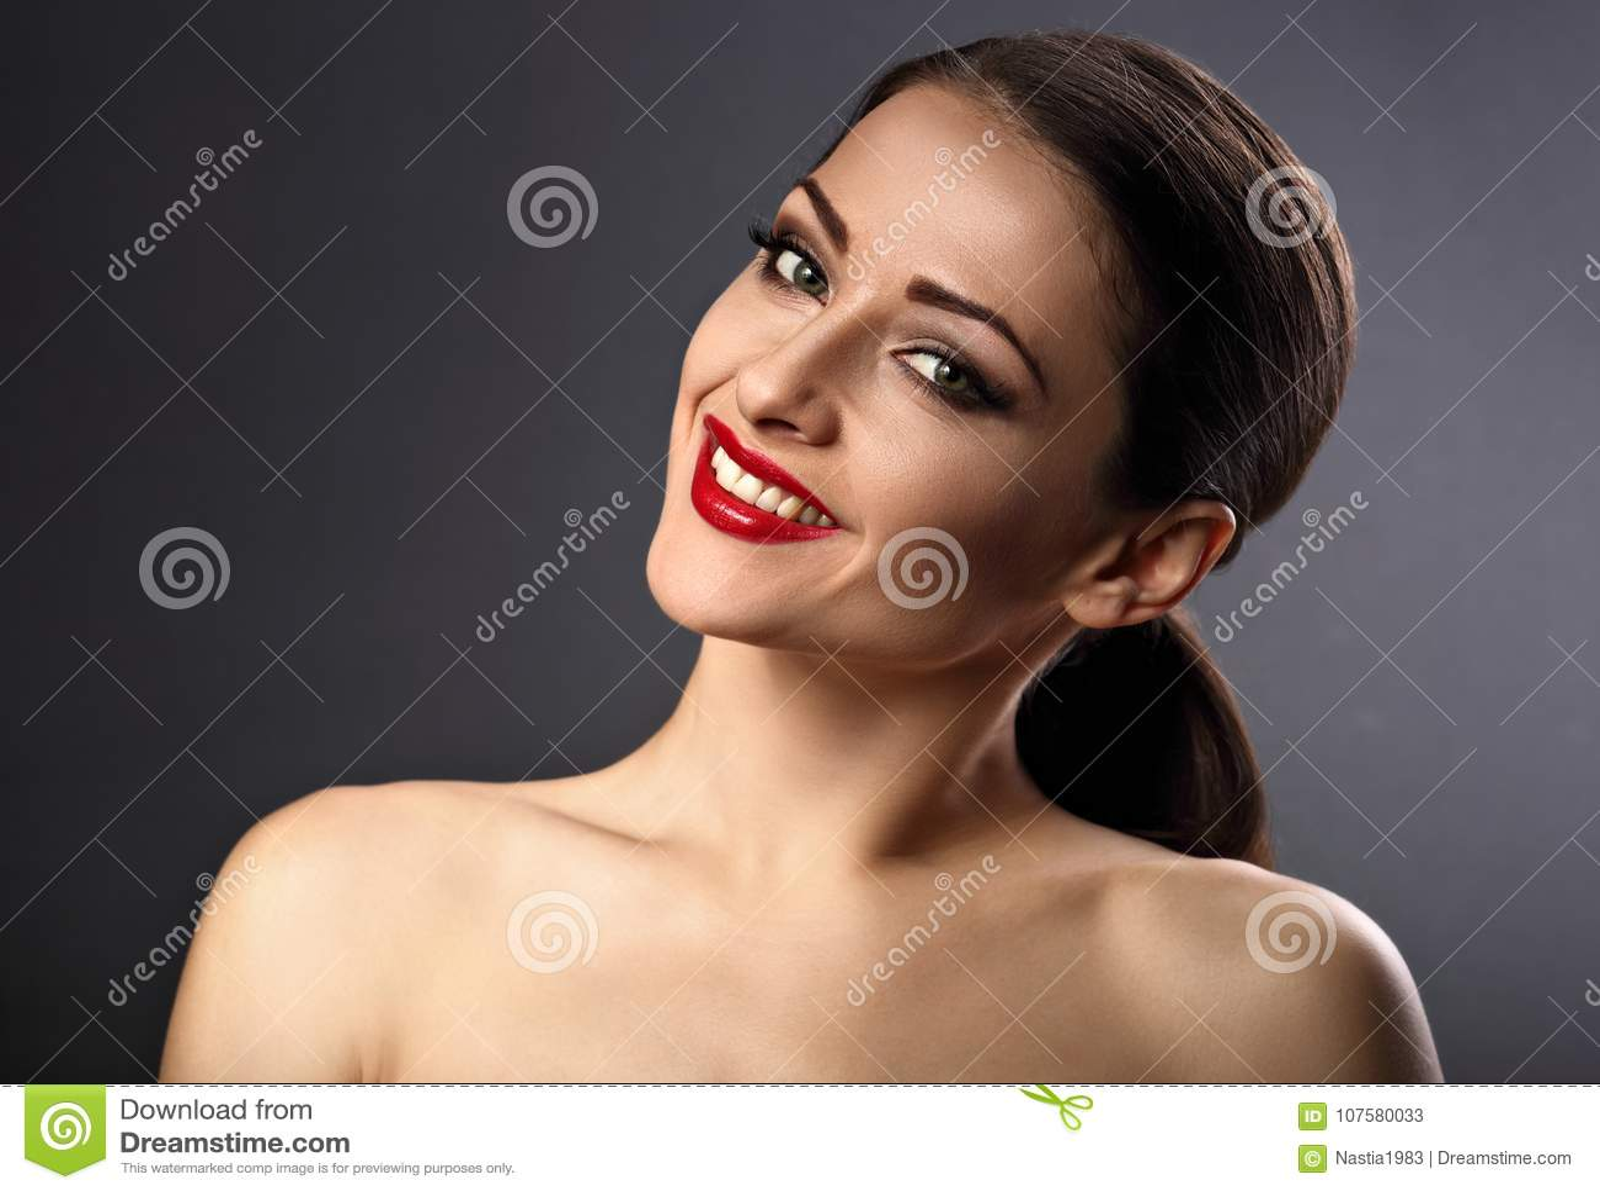 dd97fb6b7f7 Ευτυχής οδοντωτή χαμογελώντας γυναίκα ομορφιάς με το κόκκινο κραγιόν ...